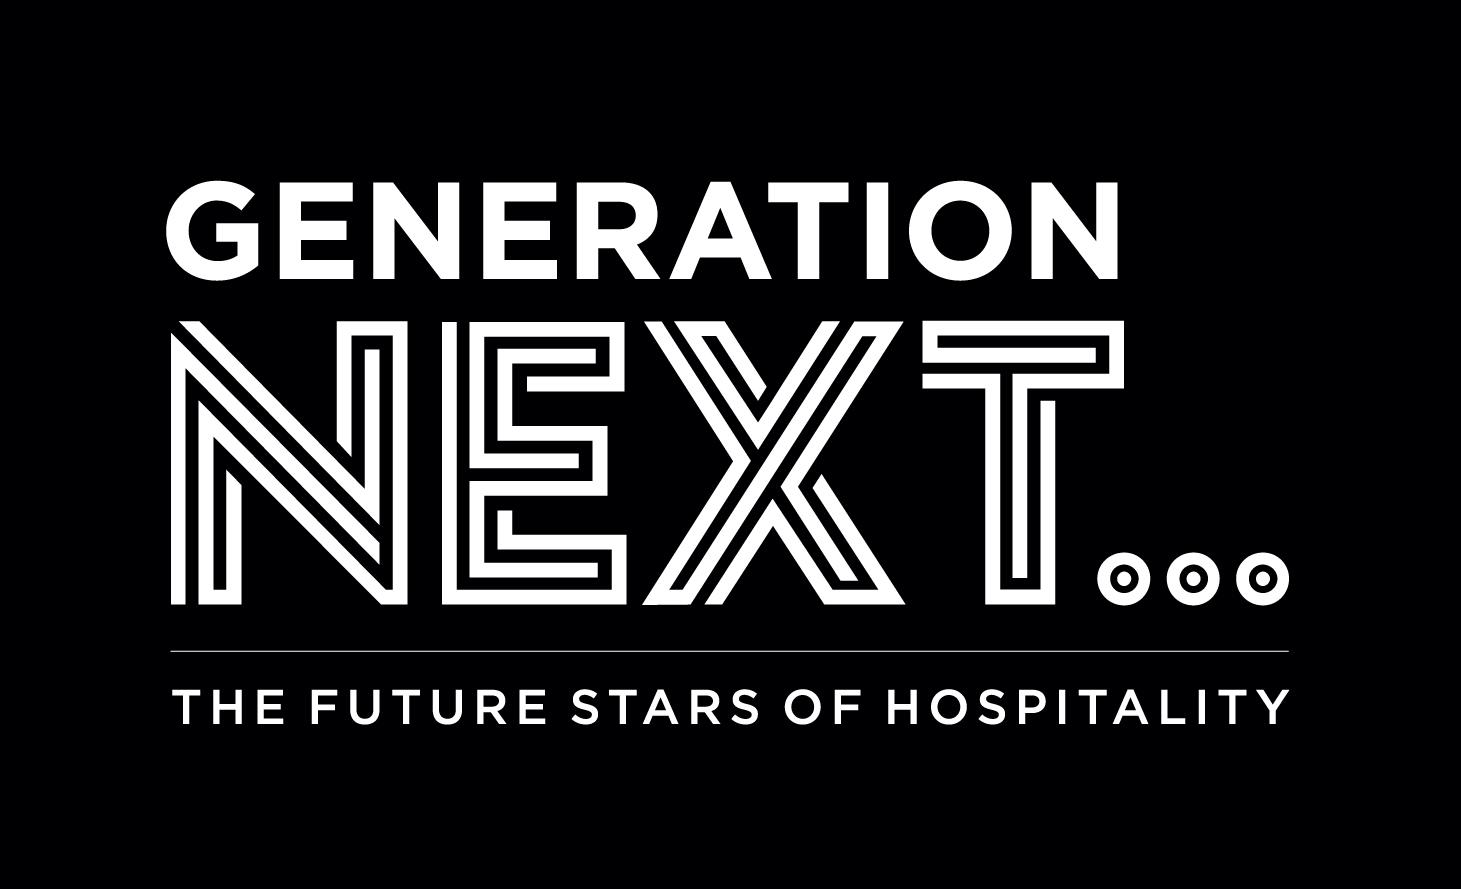 Generation Next WOB.jpg